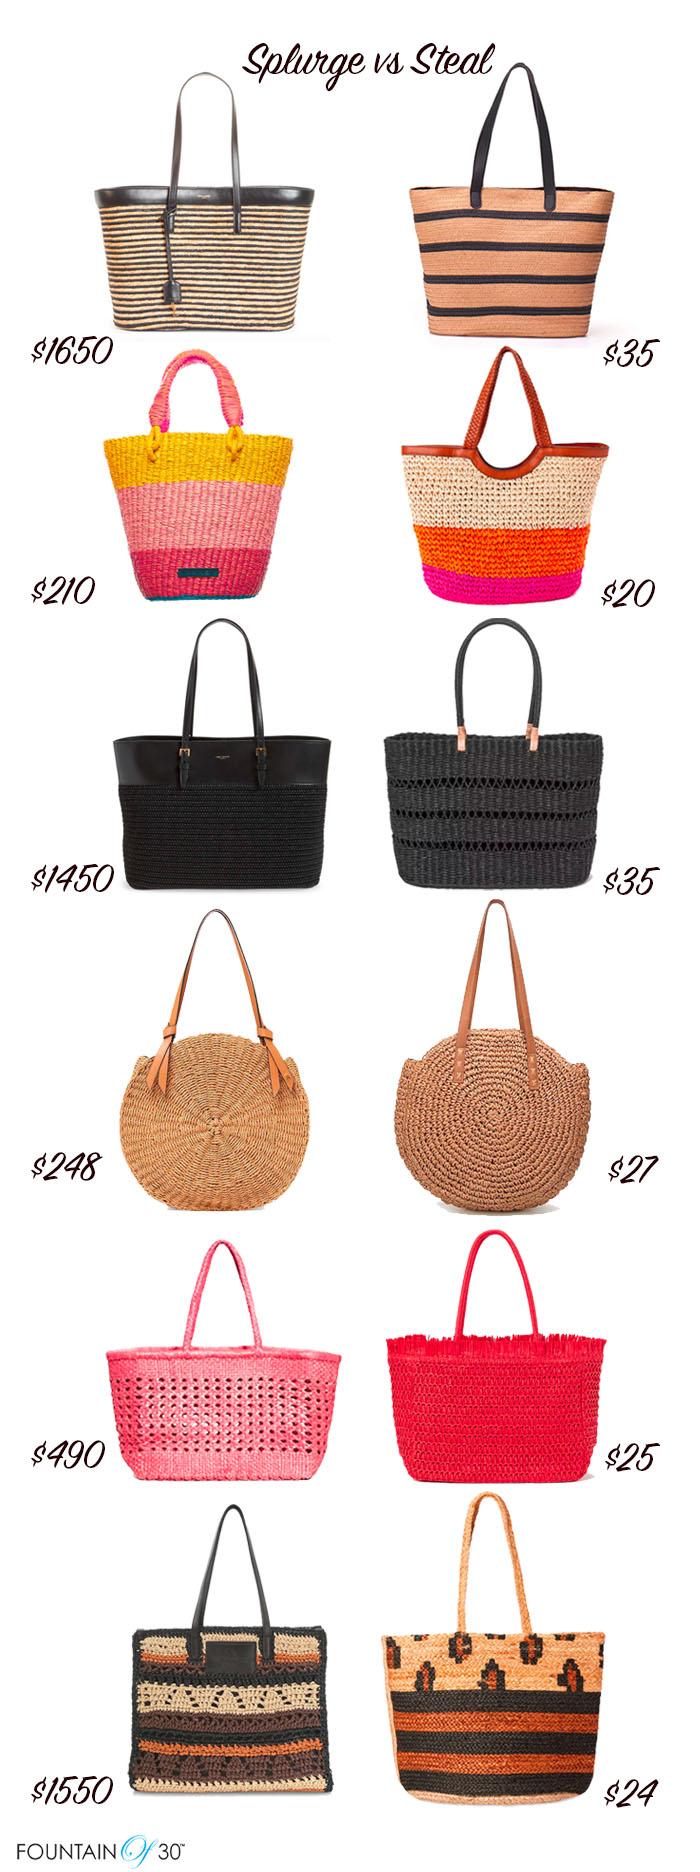 beach bags straw totes splurge vs steal fountainof30